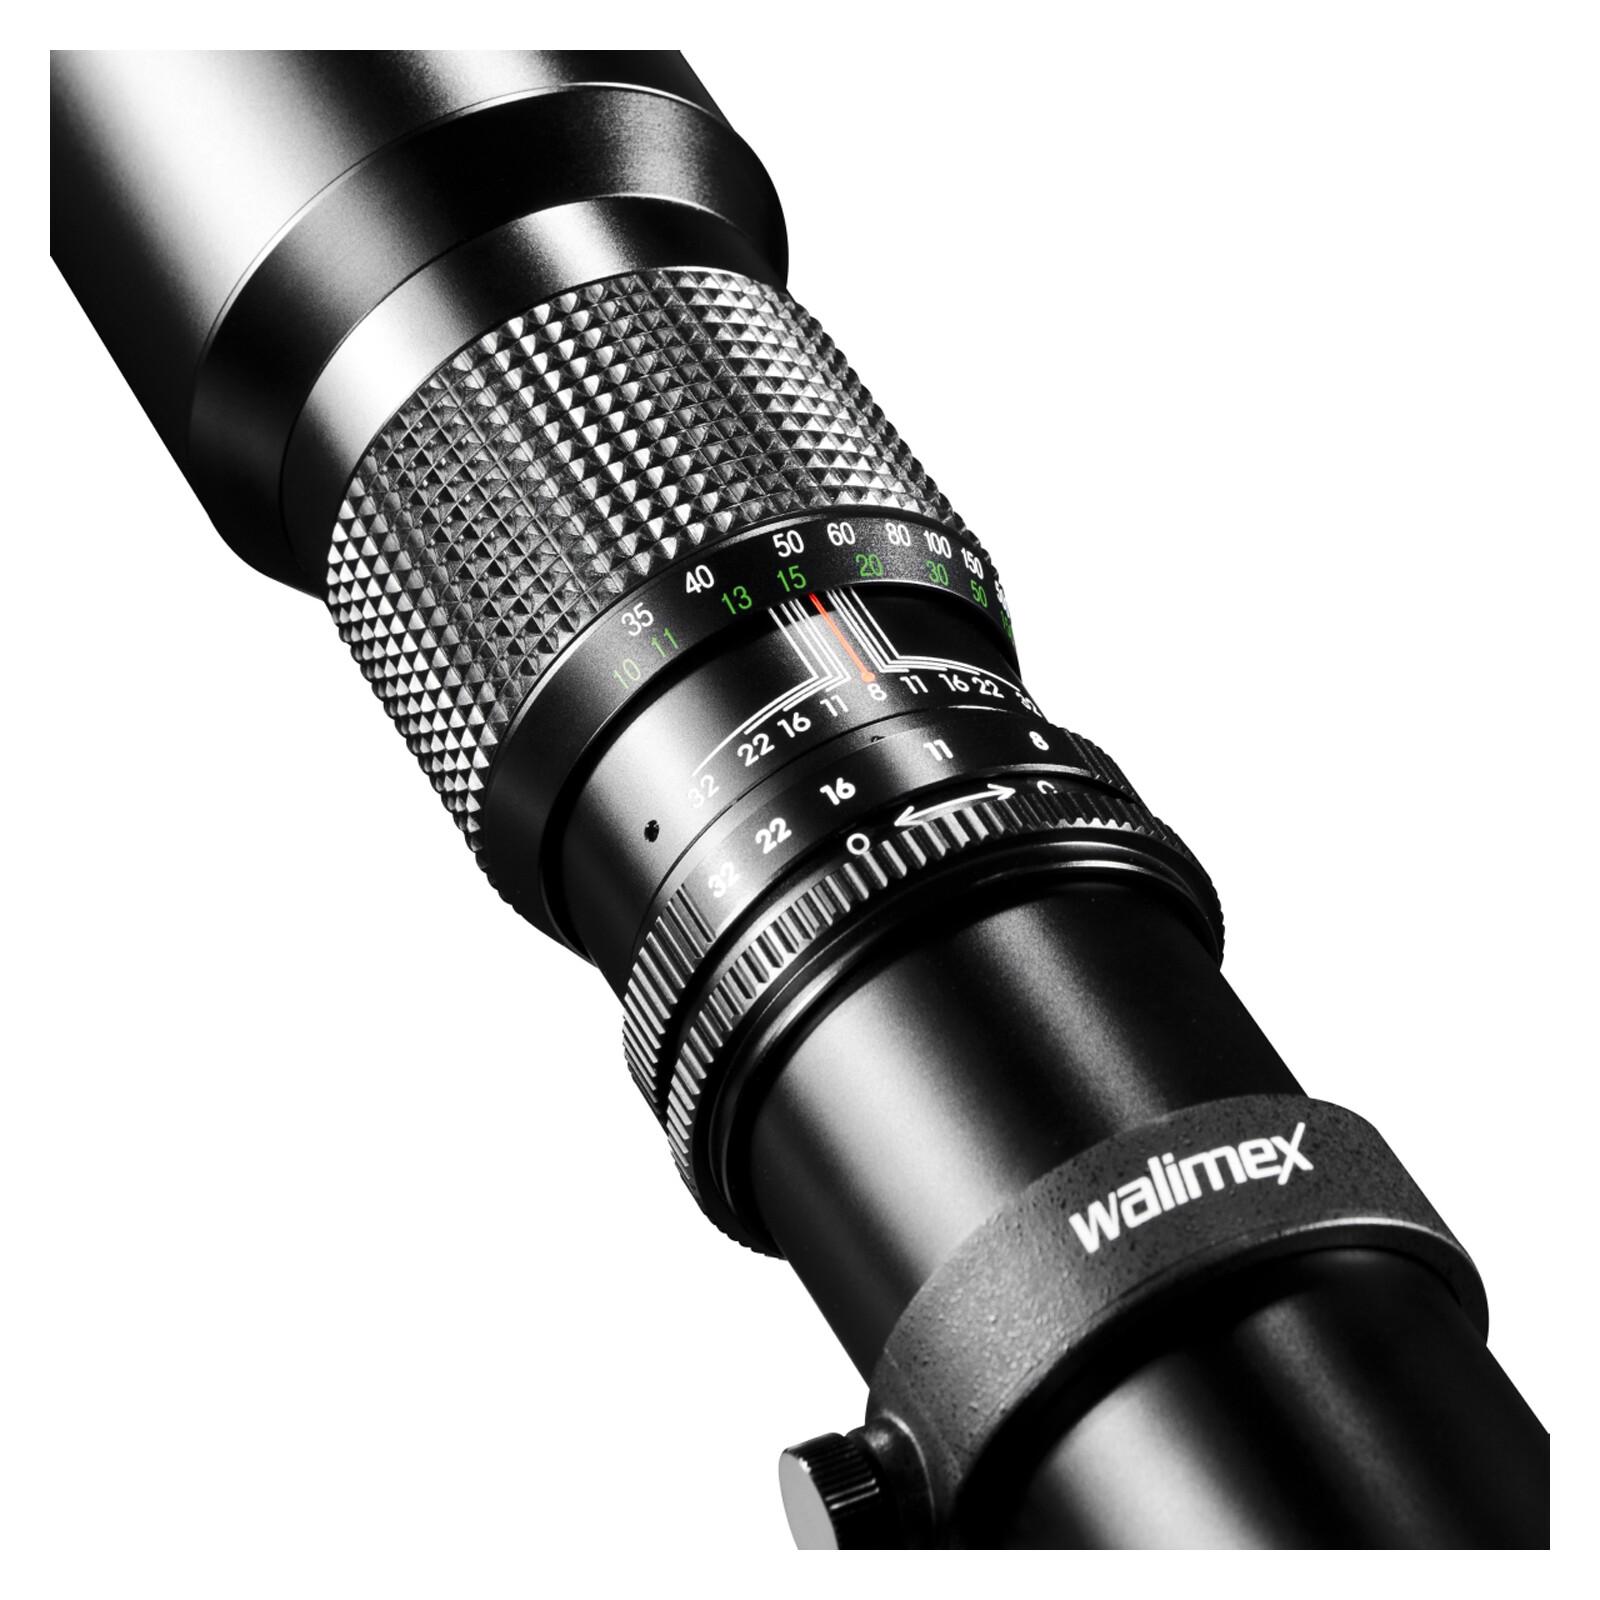 walimex 500/8,0 DSLR Canon EF  + UV Filter